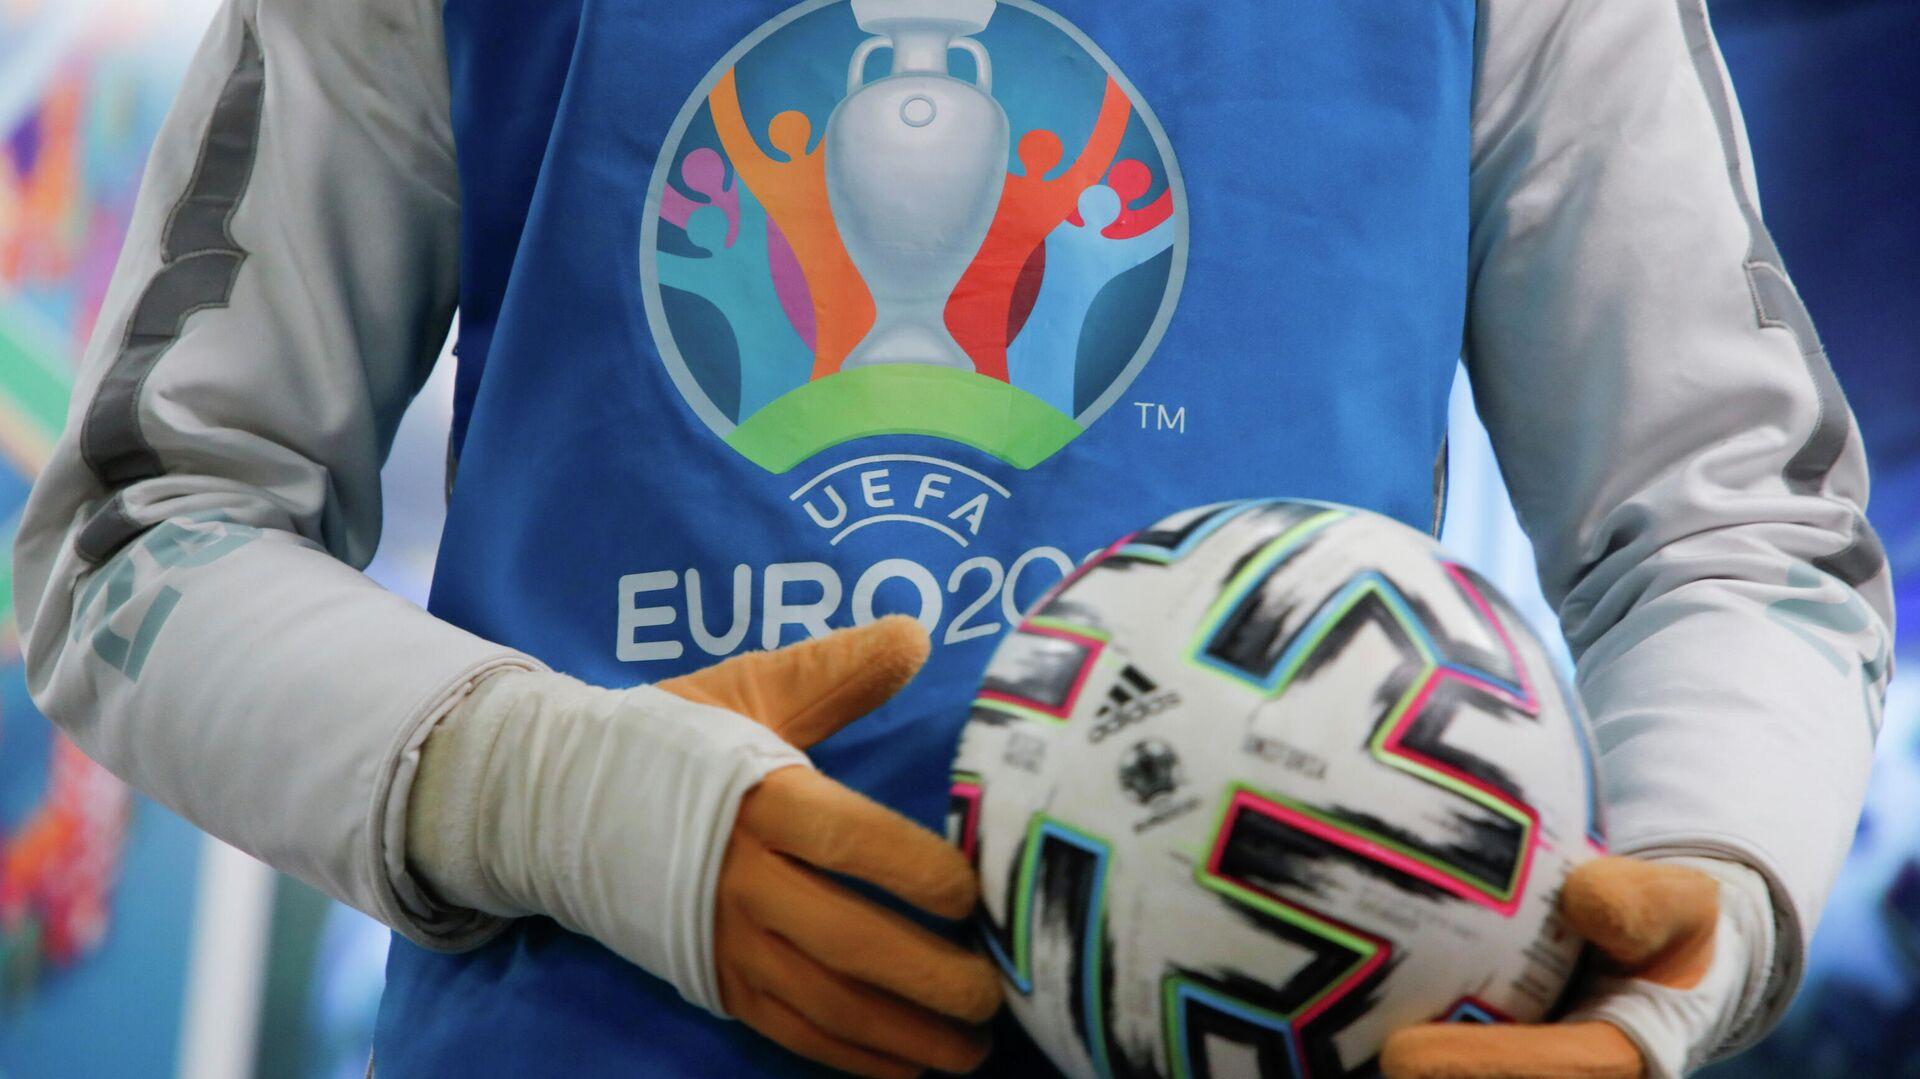 Eurocopa 2020 - Sputnik Mundo, 1920, 31.03.2021